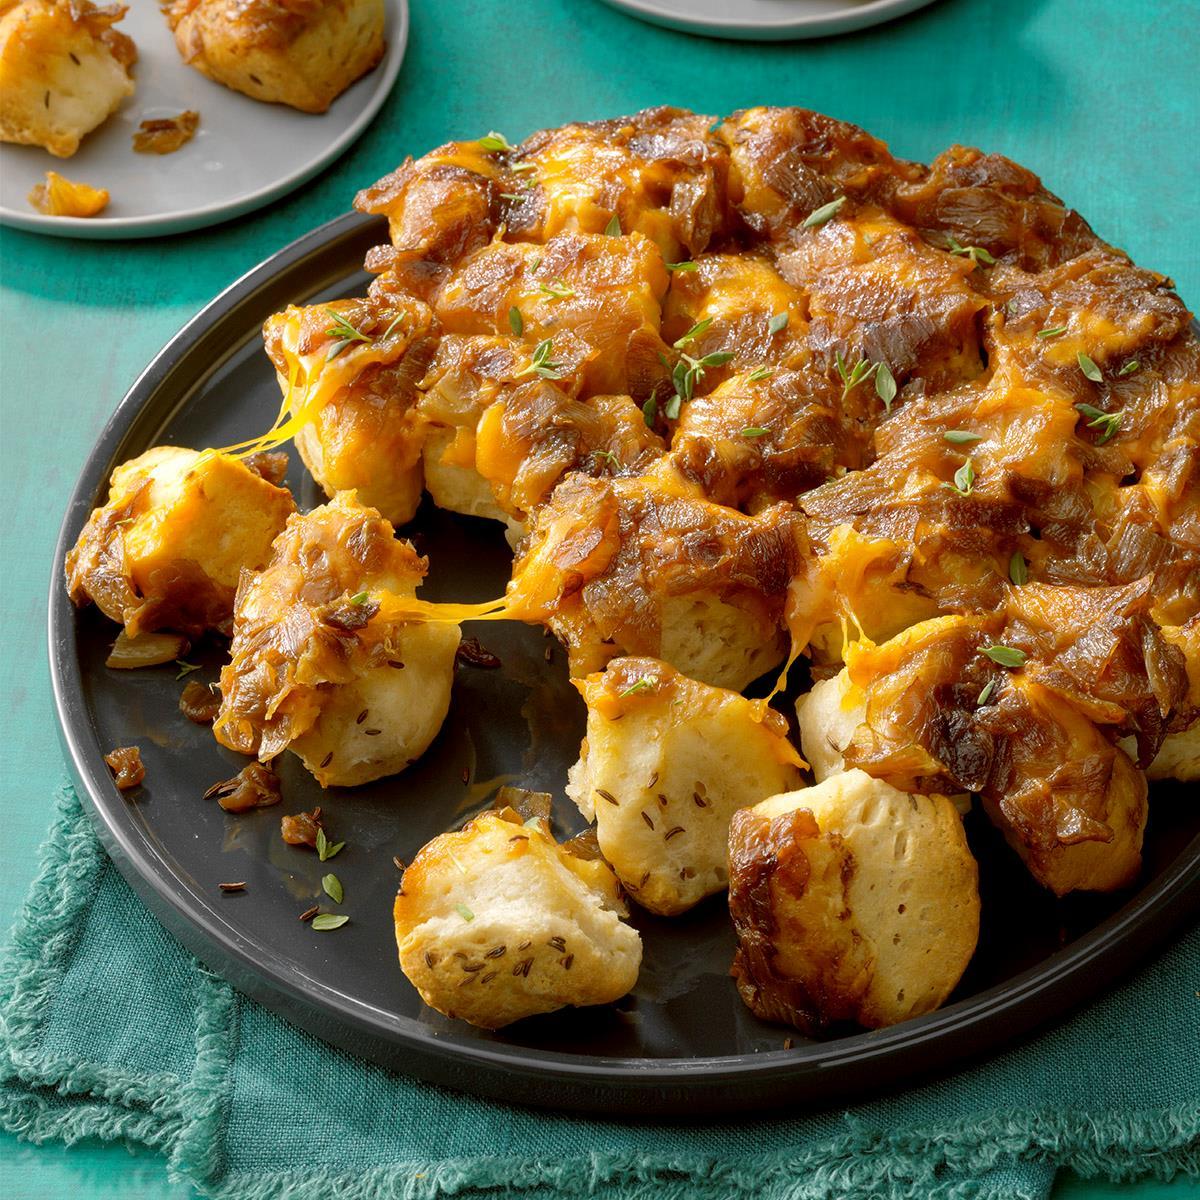 Cheesy Caramelized Onion Skillet Bread